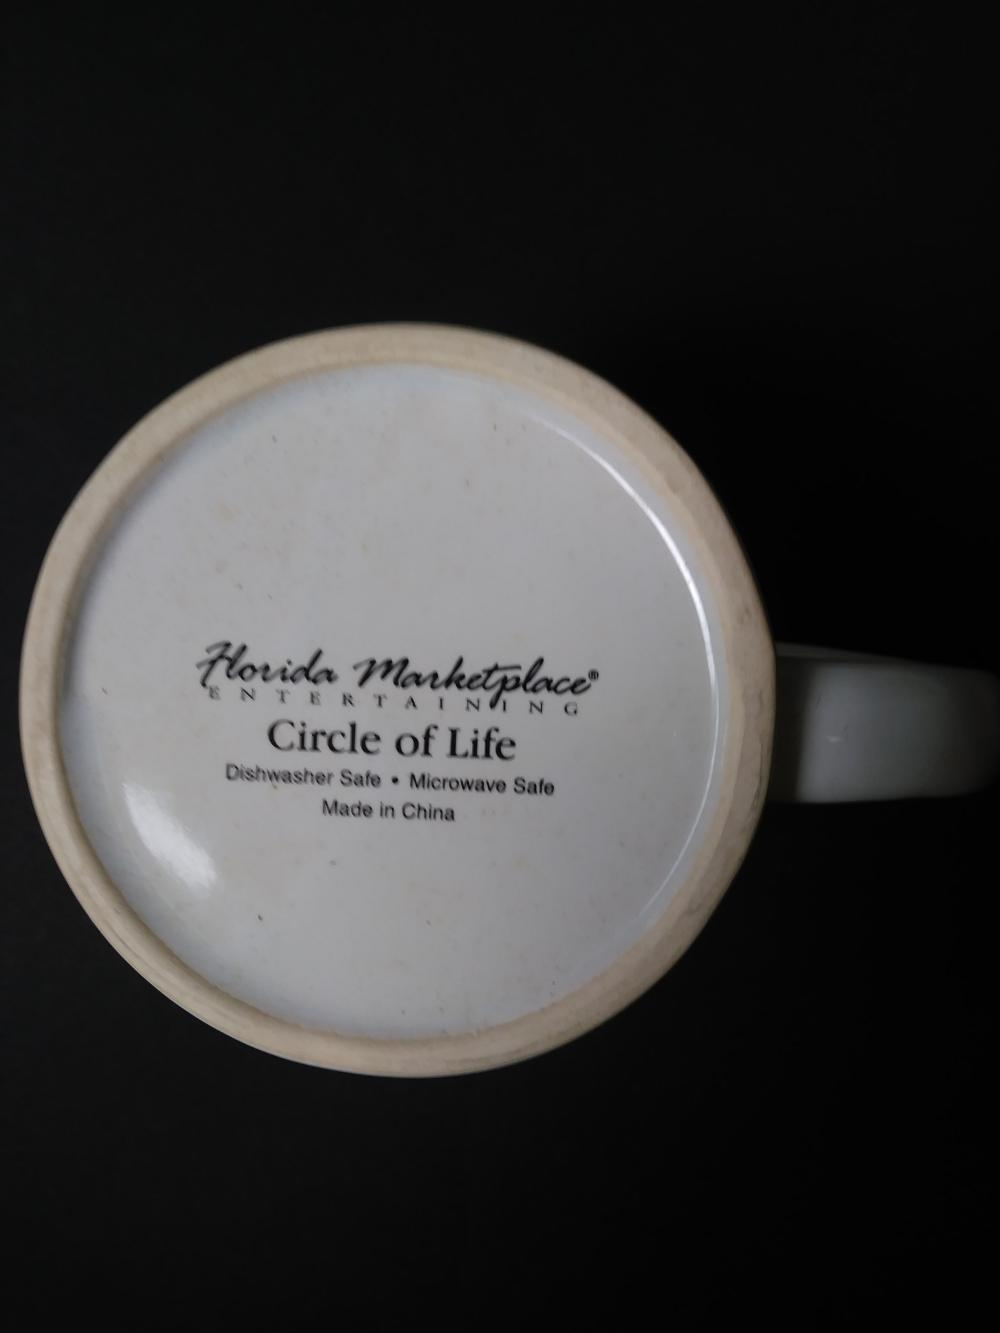 "CIRCLE OF LIFE"" - SERVICE FOR 12 - FLORIDA MARKETPLACE ENTE"